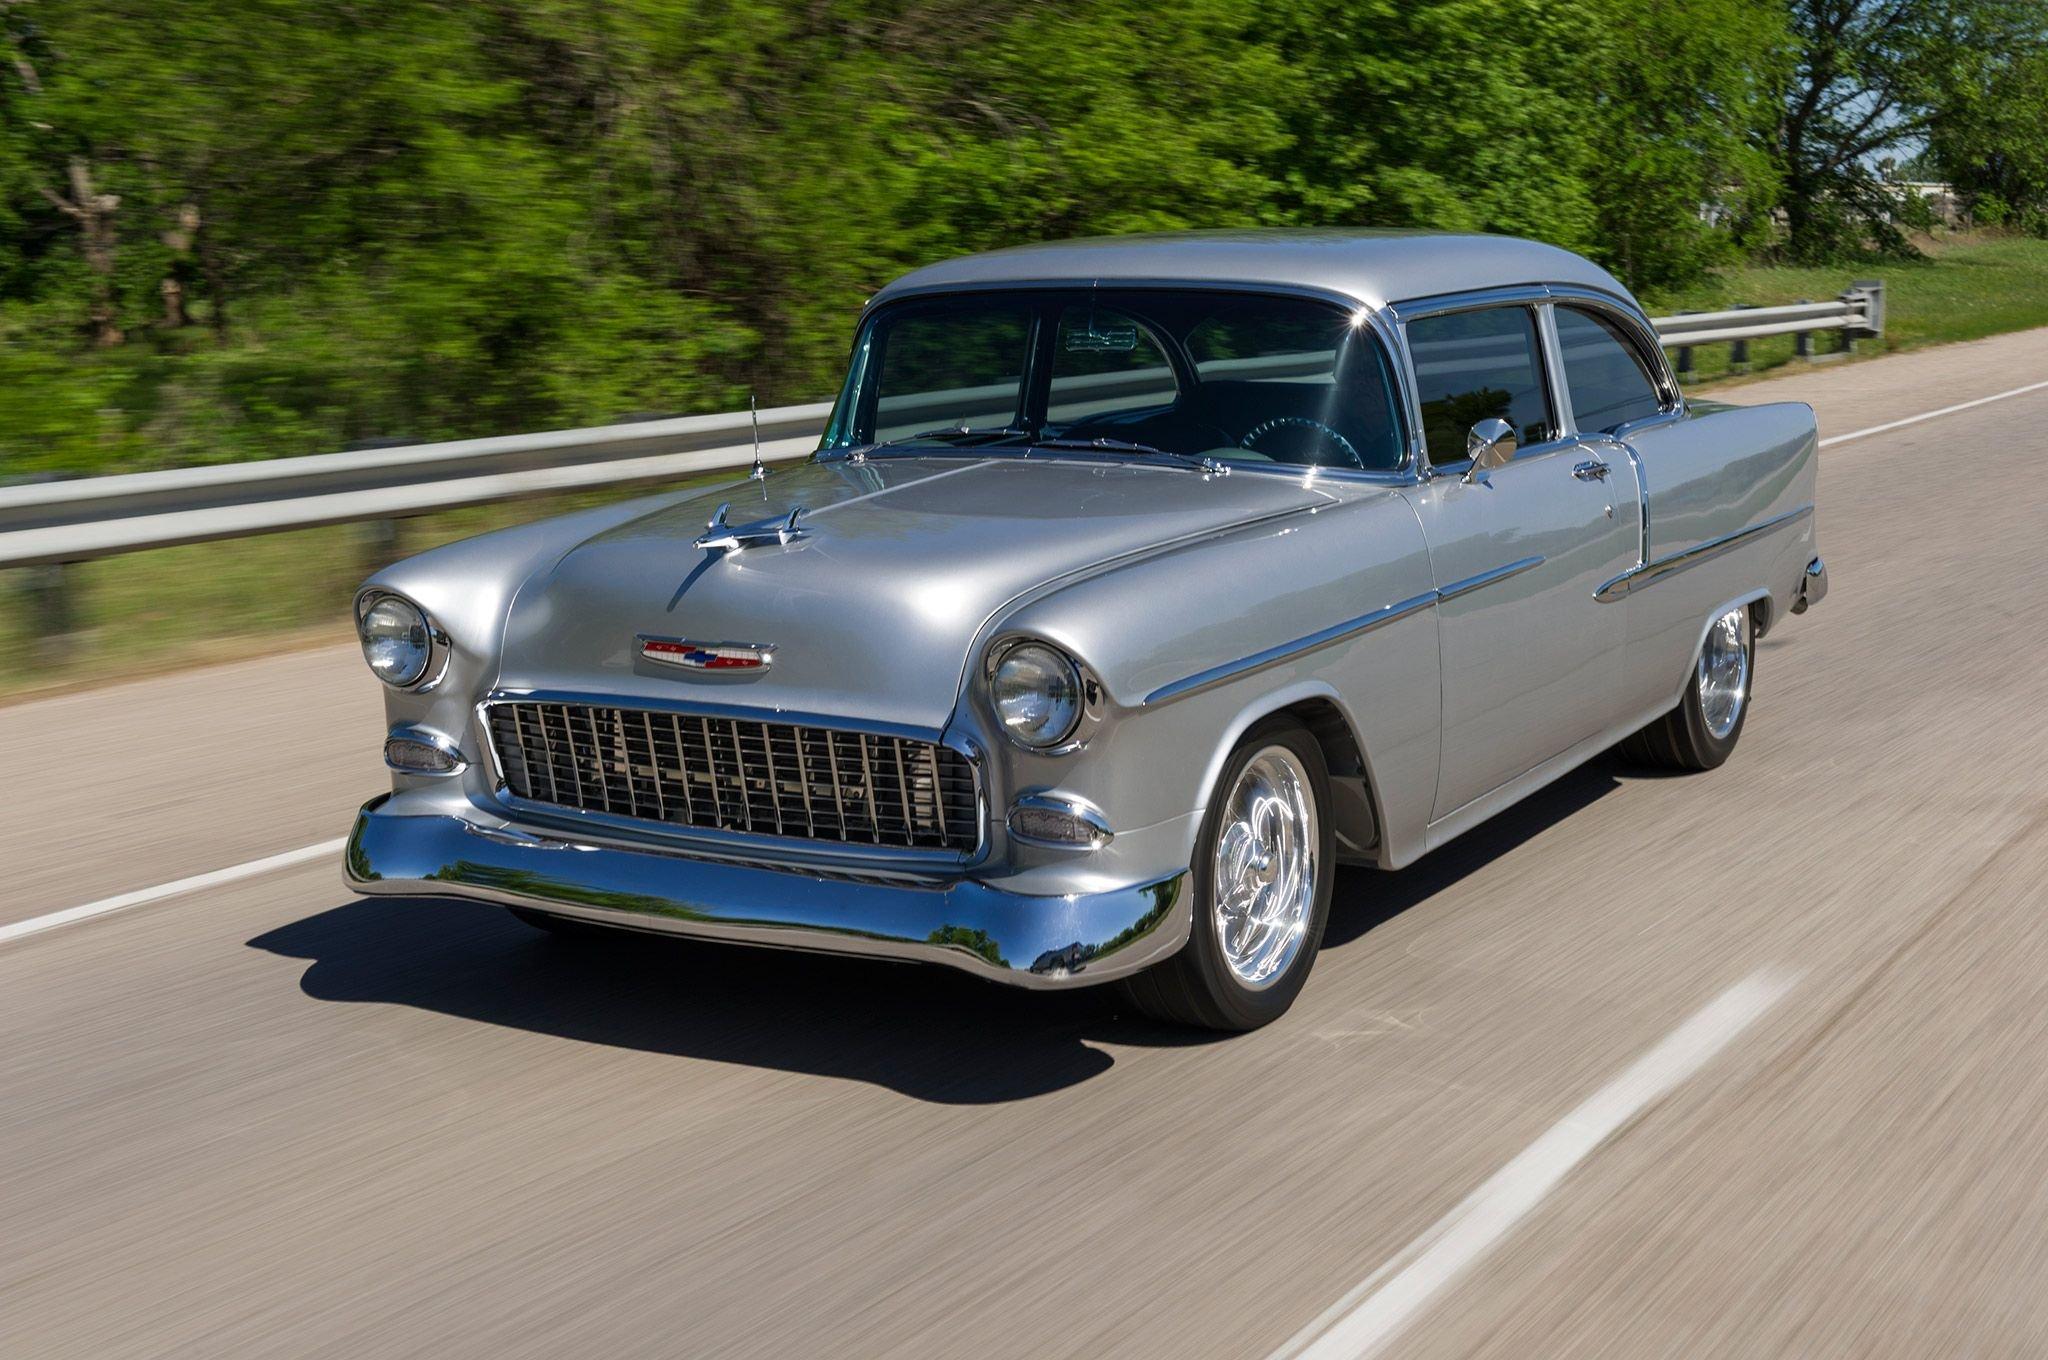 1955 Chevrolet Chevy Bel Air Streetrod Street Rod Cruiser USA 2048x1360